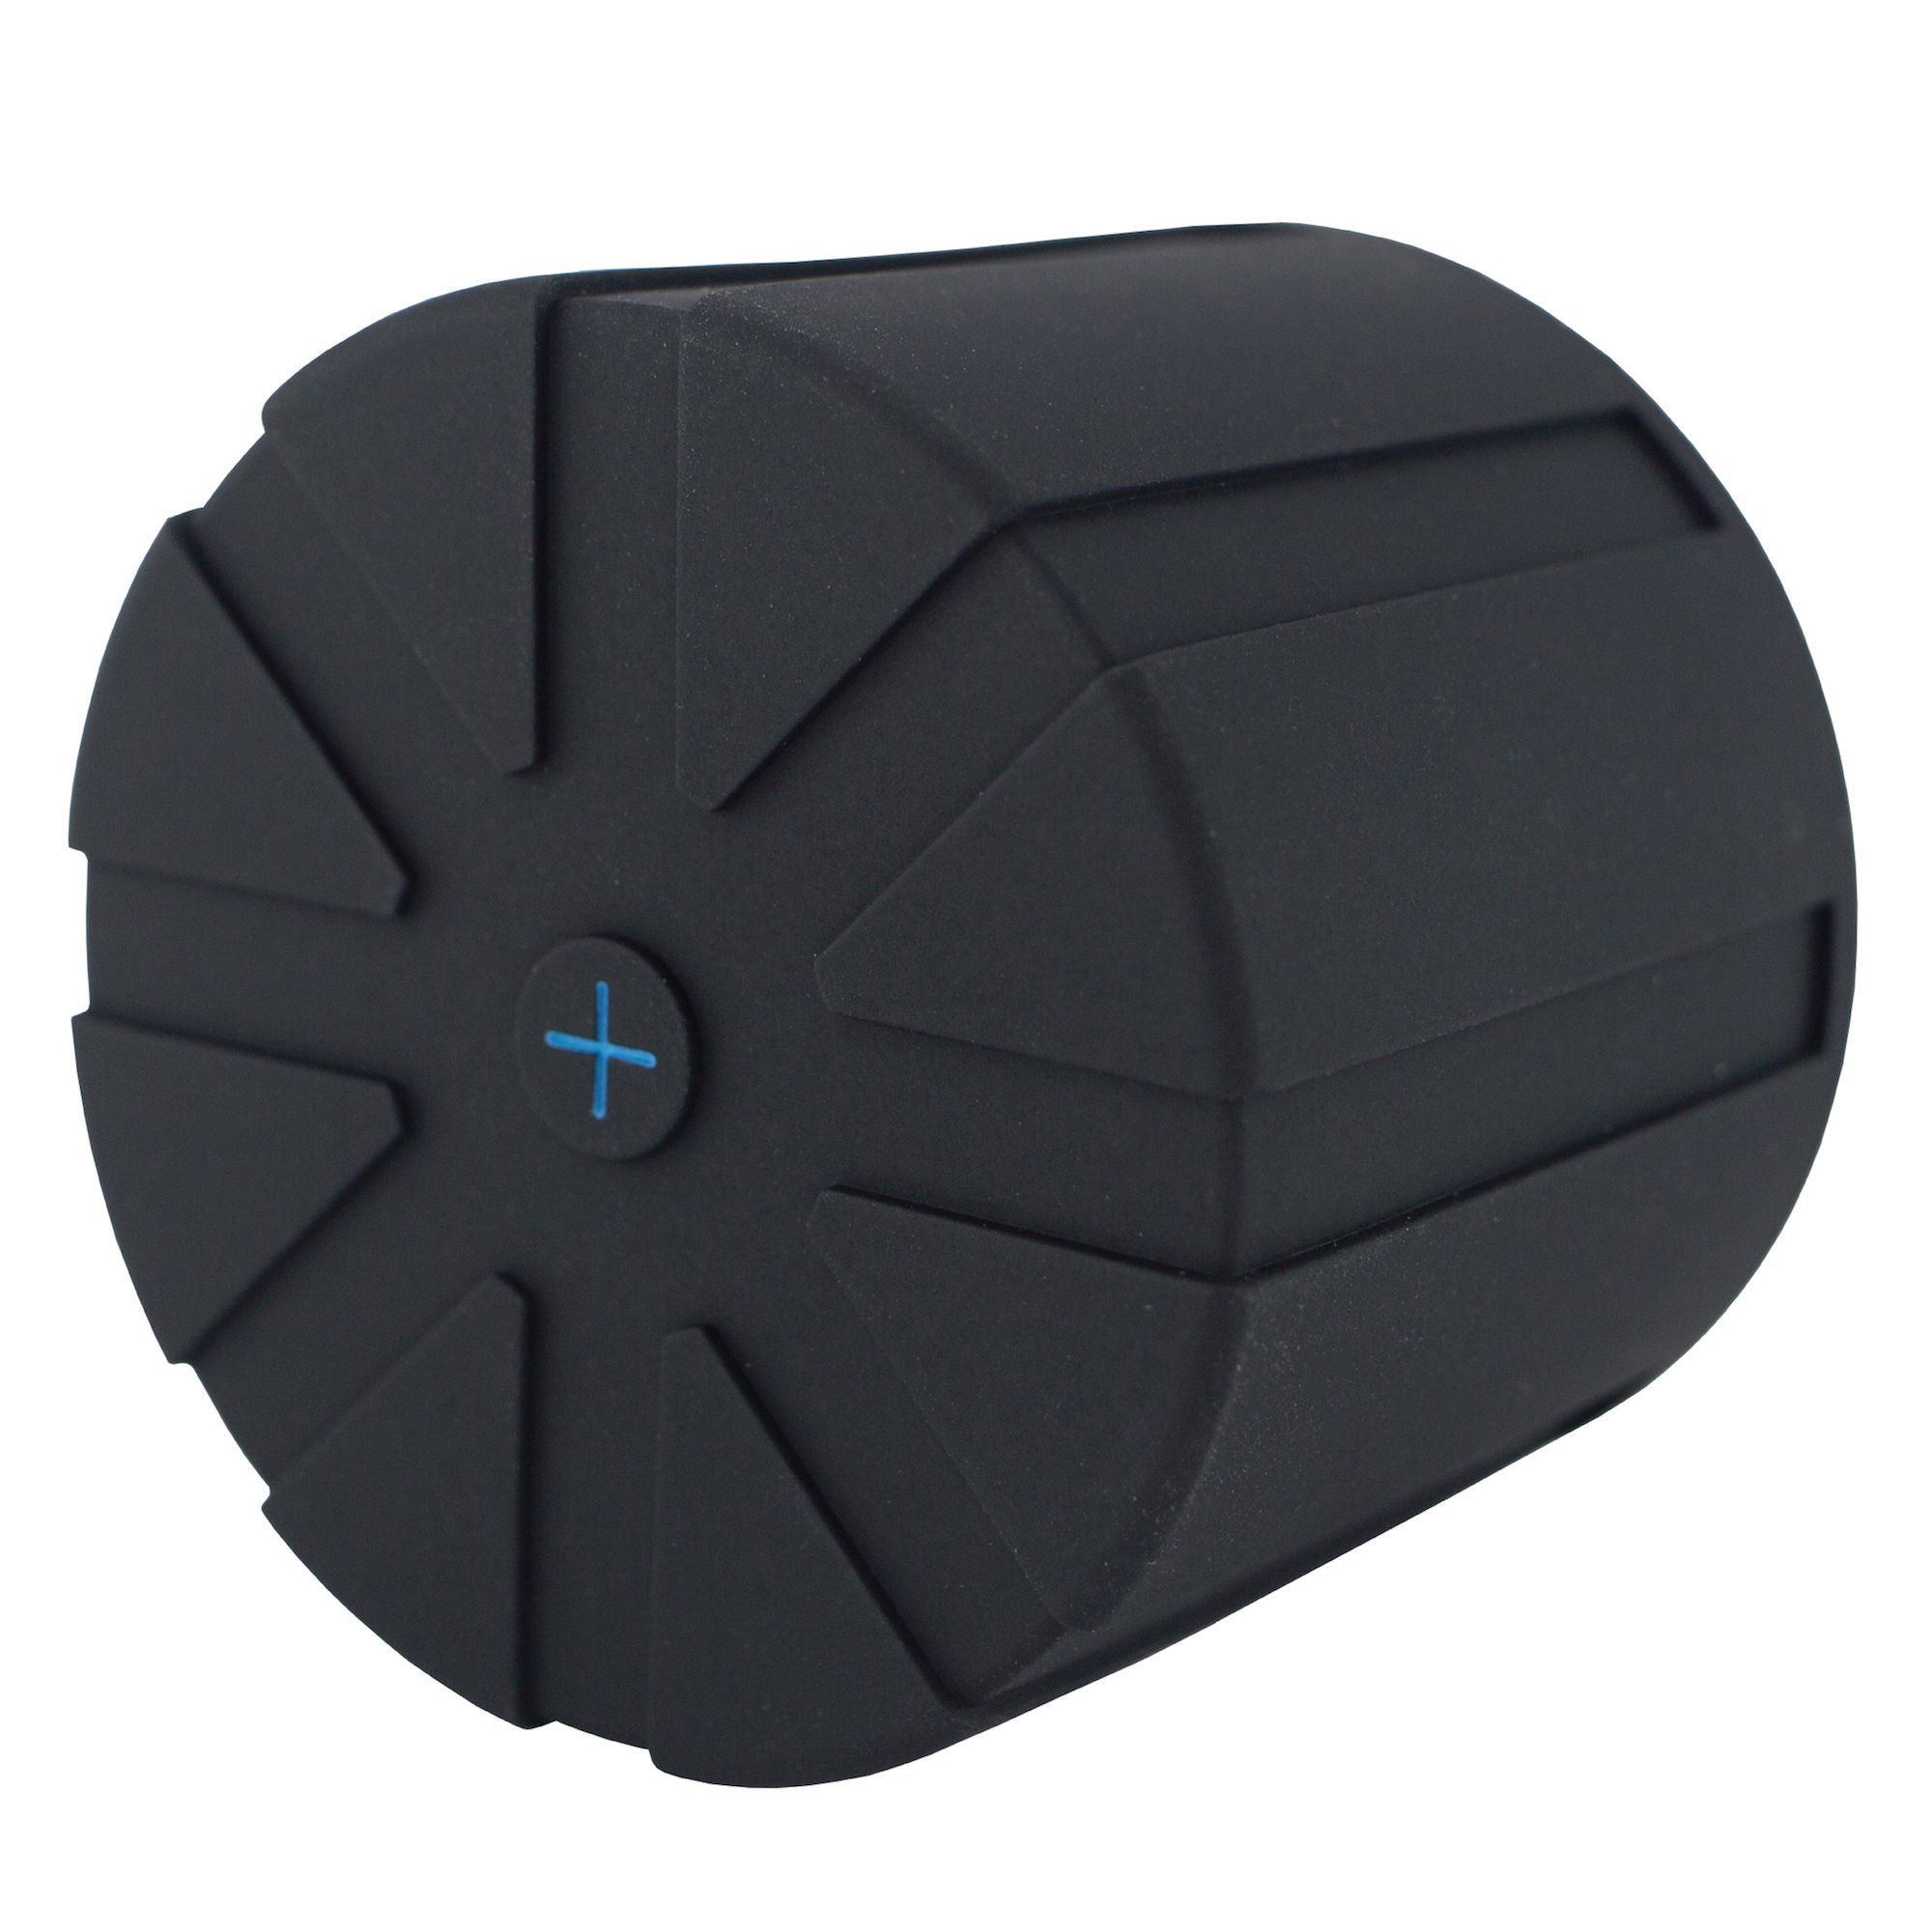 KUVRD - Universal Lens Cap - Fits 99% of DSLR lenses, Element Proof, Limited Lifetime Warranty, Single Lens Cap by KUVRD